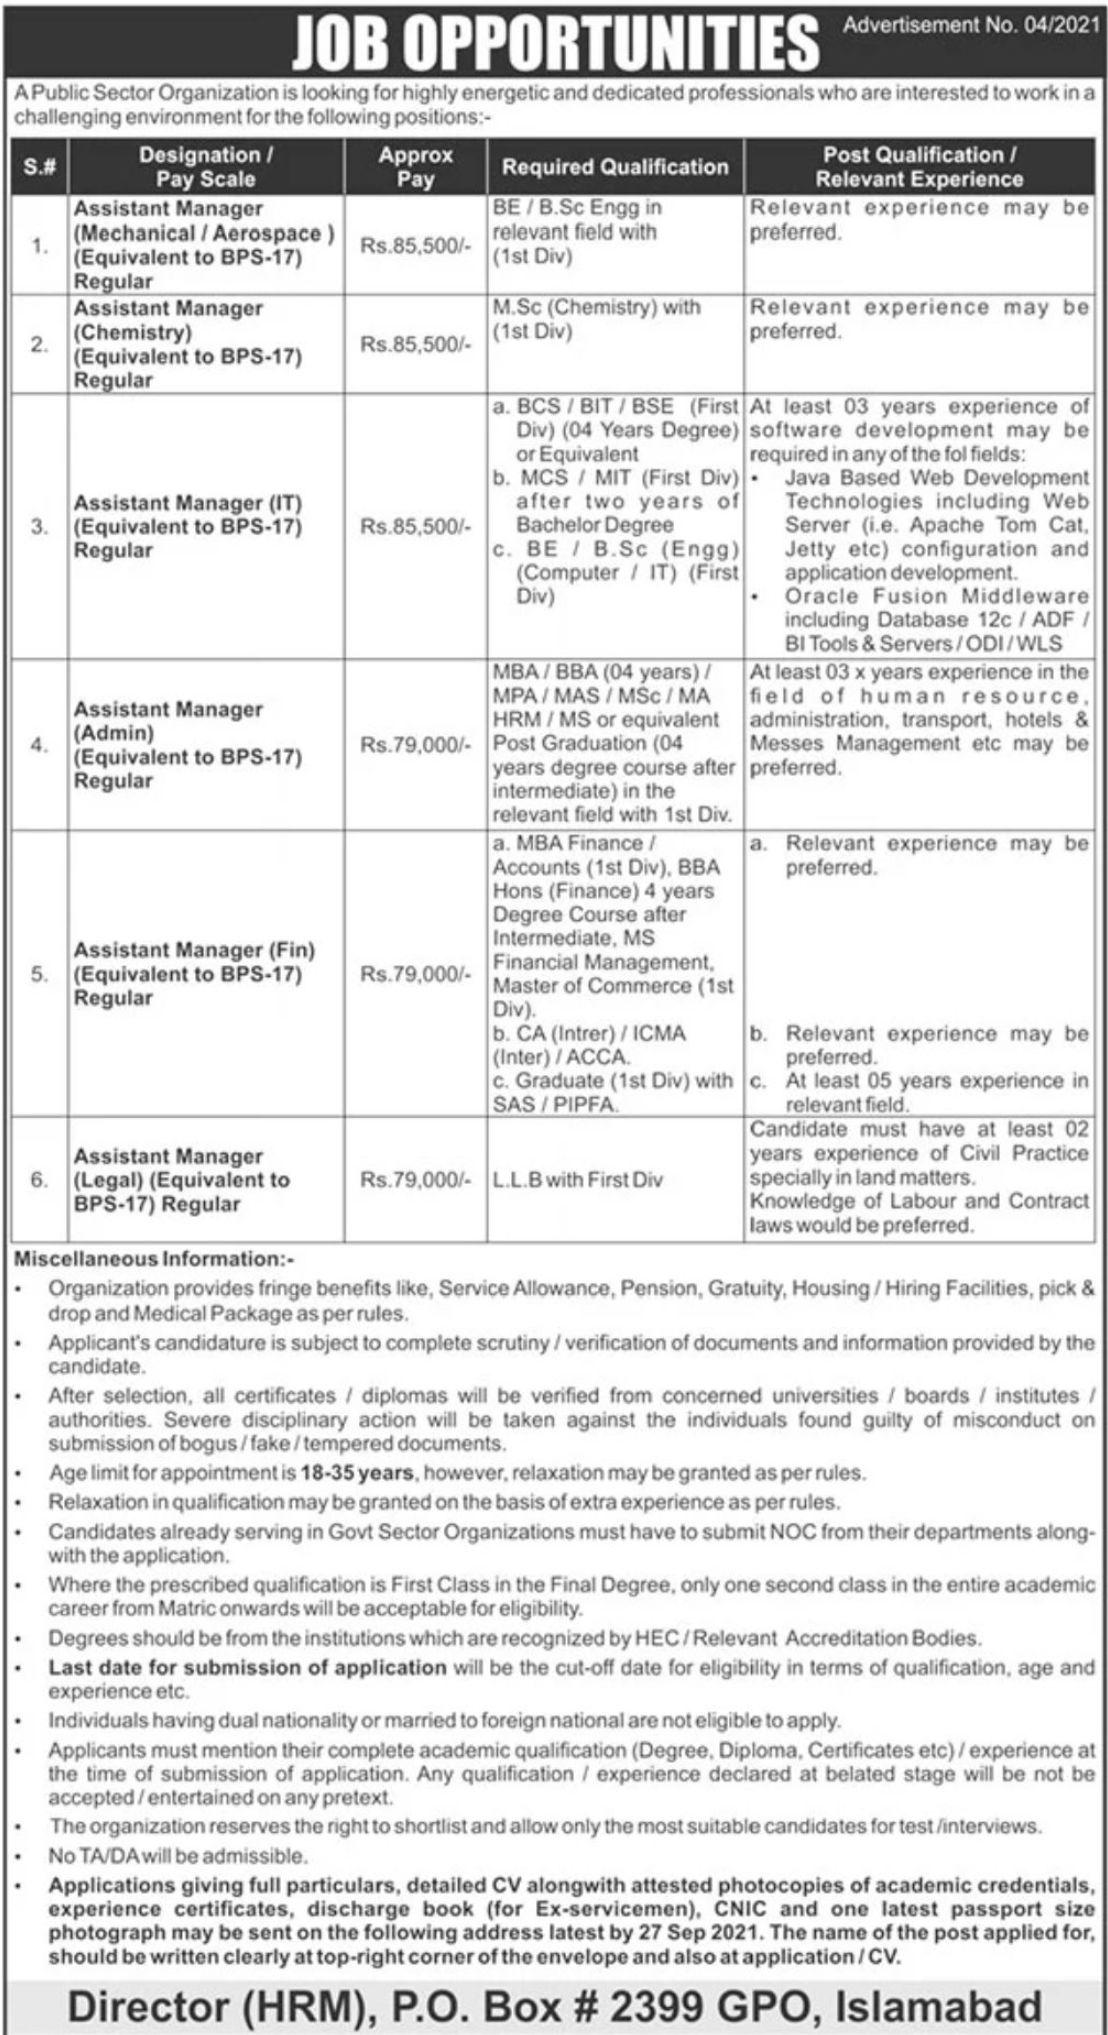 Public Sector Organization PO Box No 2399 GPO Islamabad Vacancies 2021 – Dailyjobs.pk 3